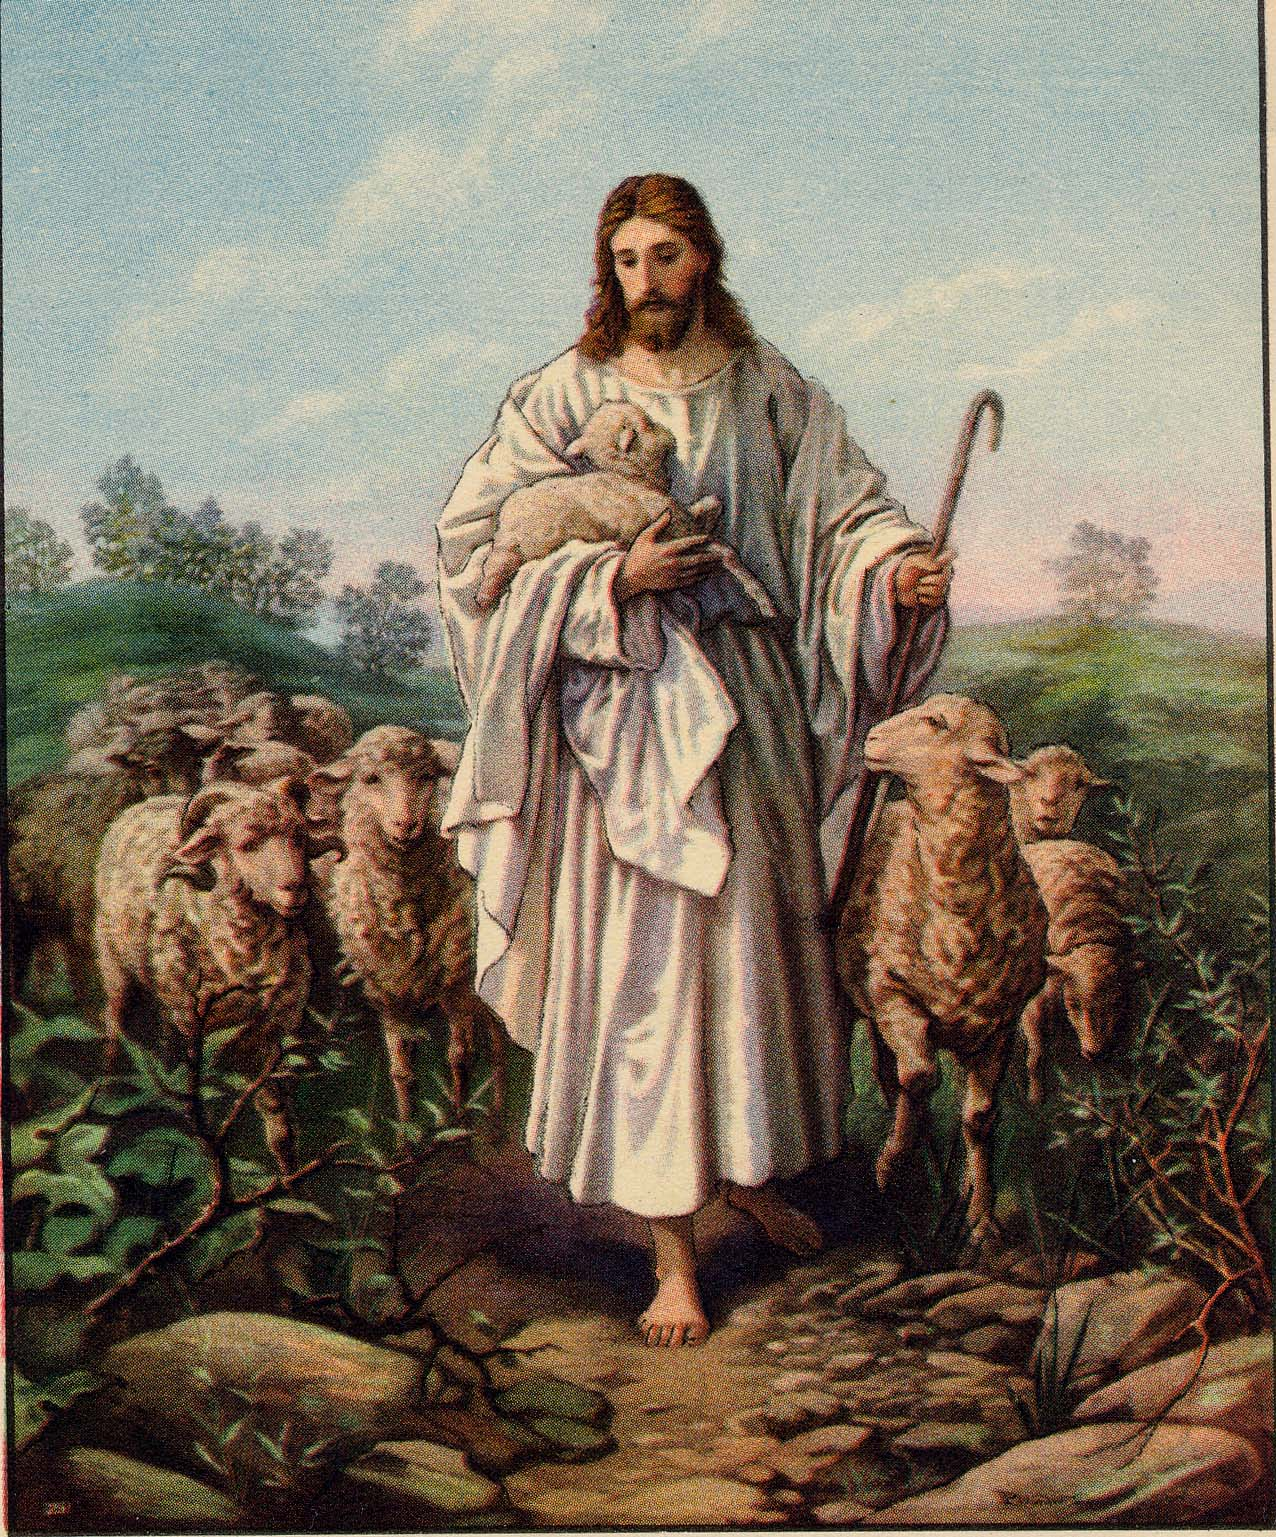 Sjungande Aposteln: Vår Herde | {Herde 43}